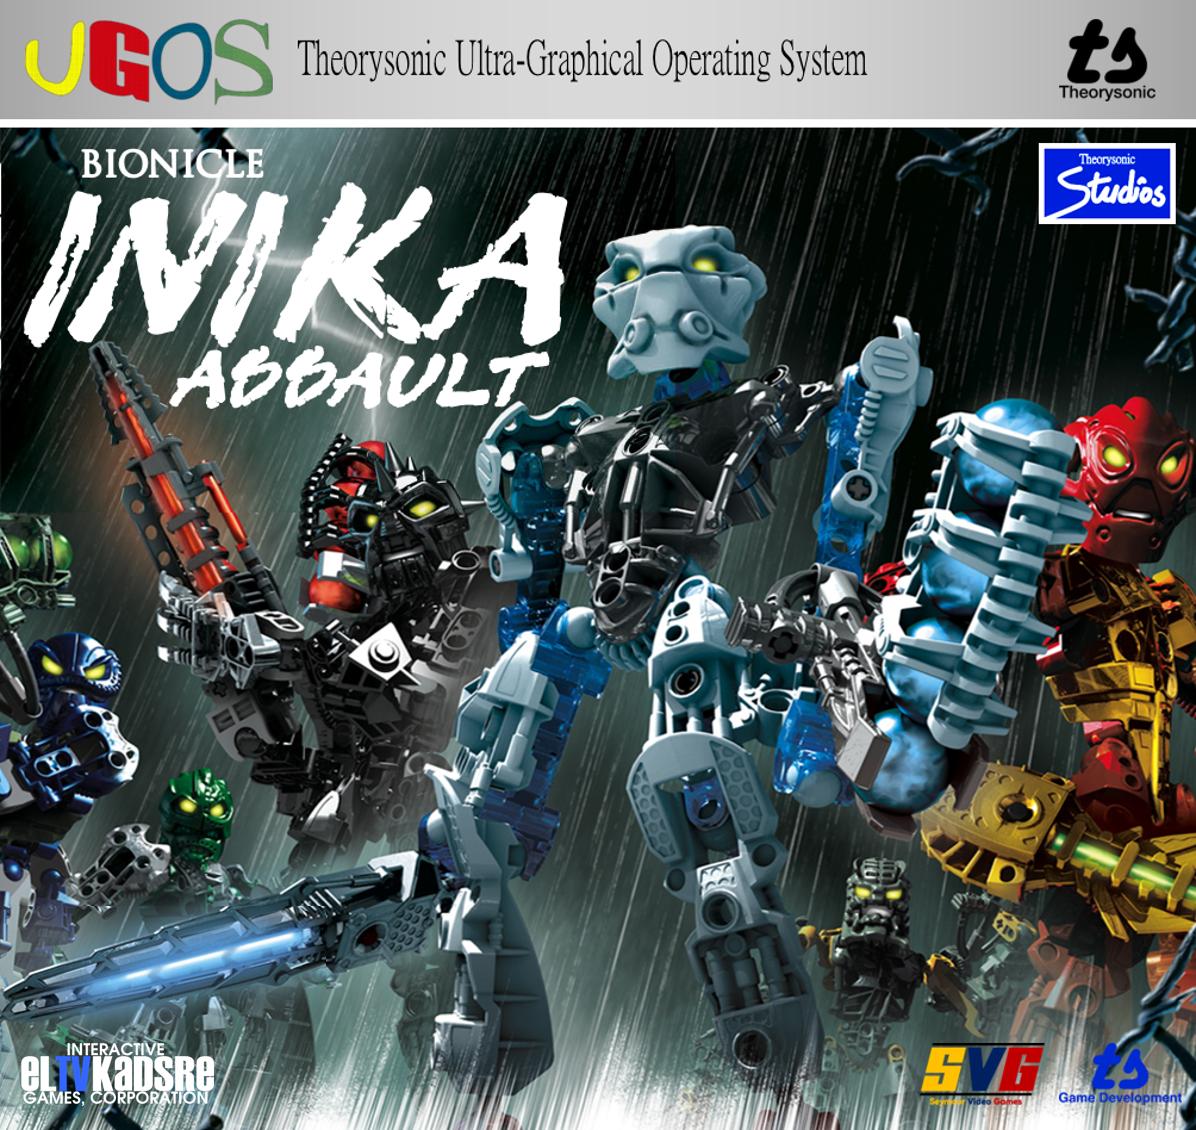 Bionicle: Inika Assault